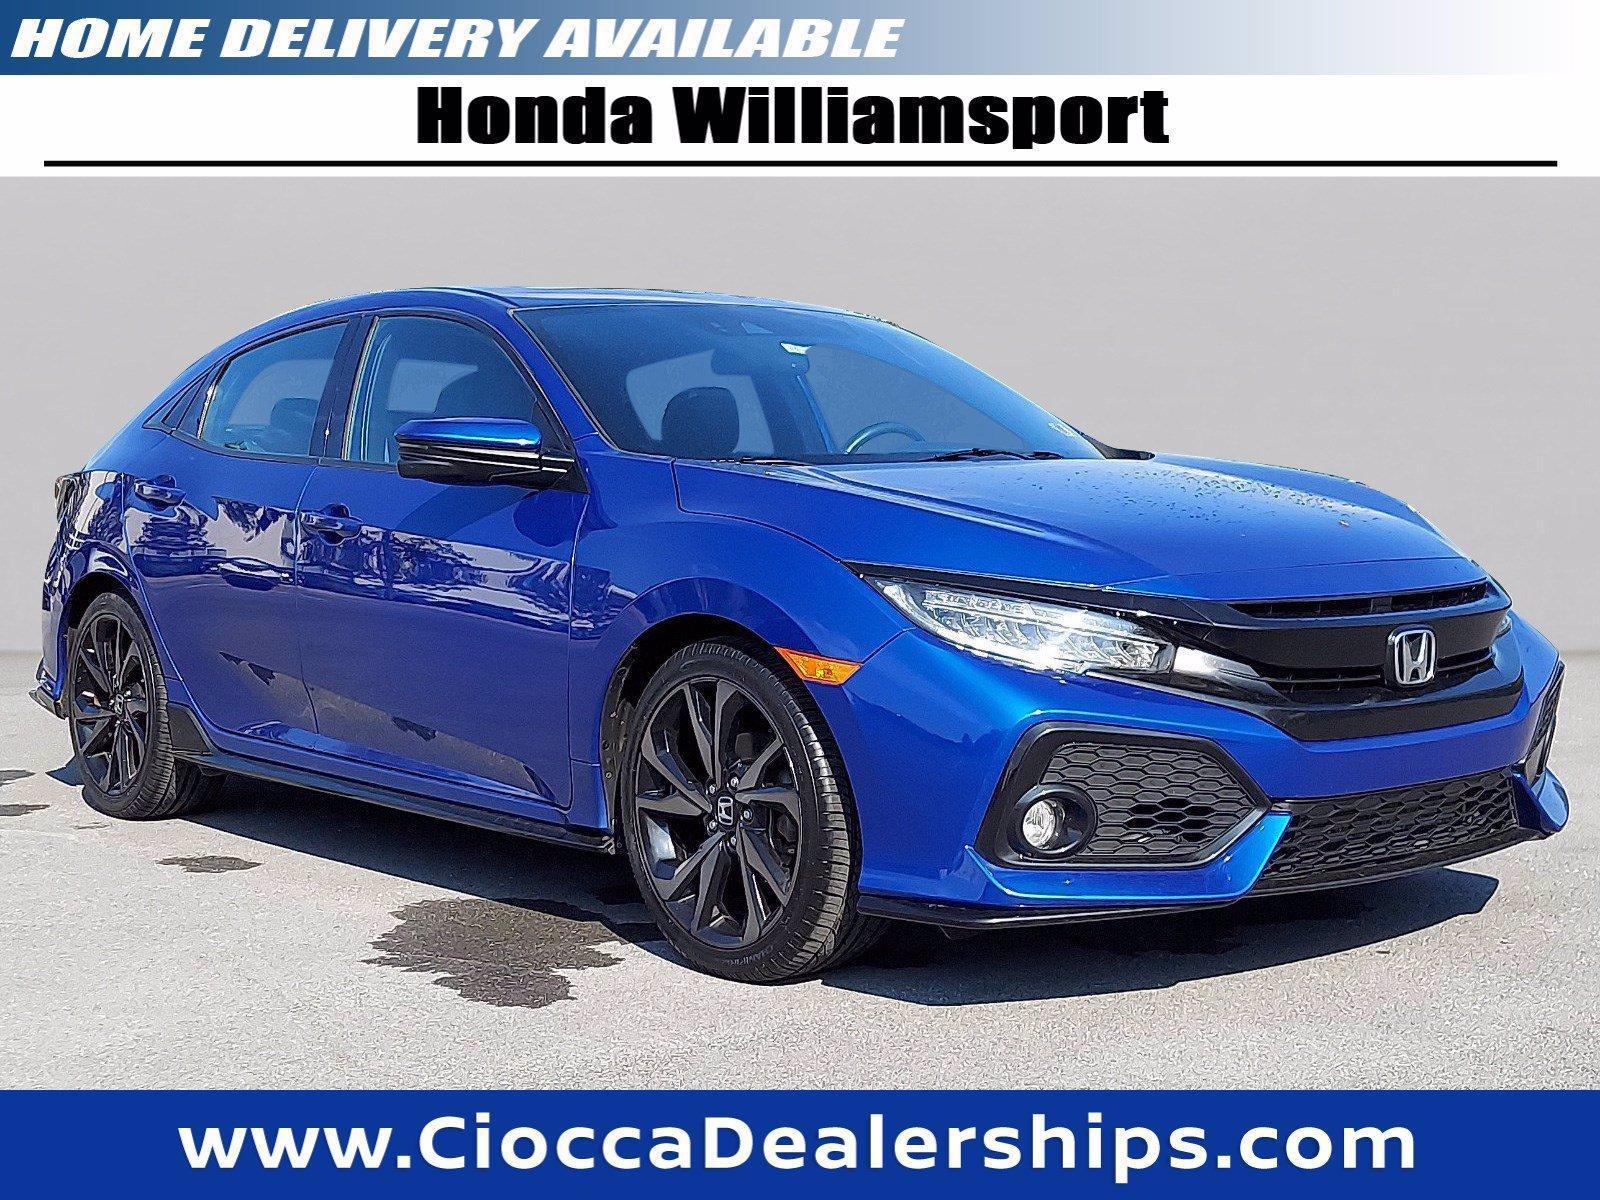 2018 Honda Civic Hatchback Vehicle Photo in Muncy, PA 17756